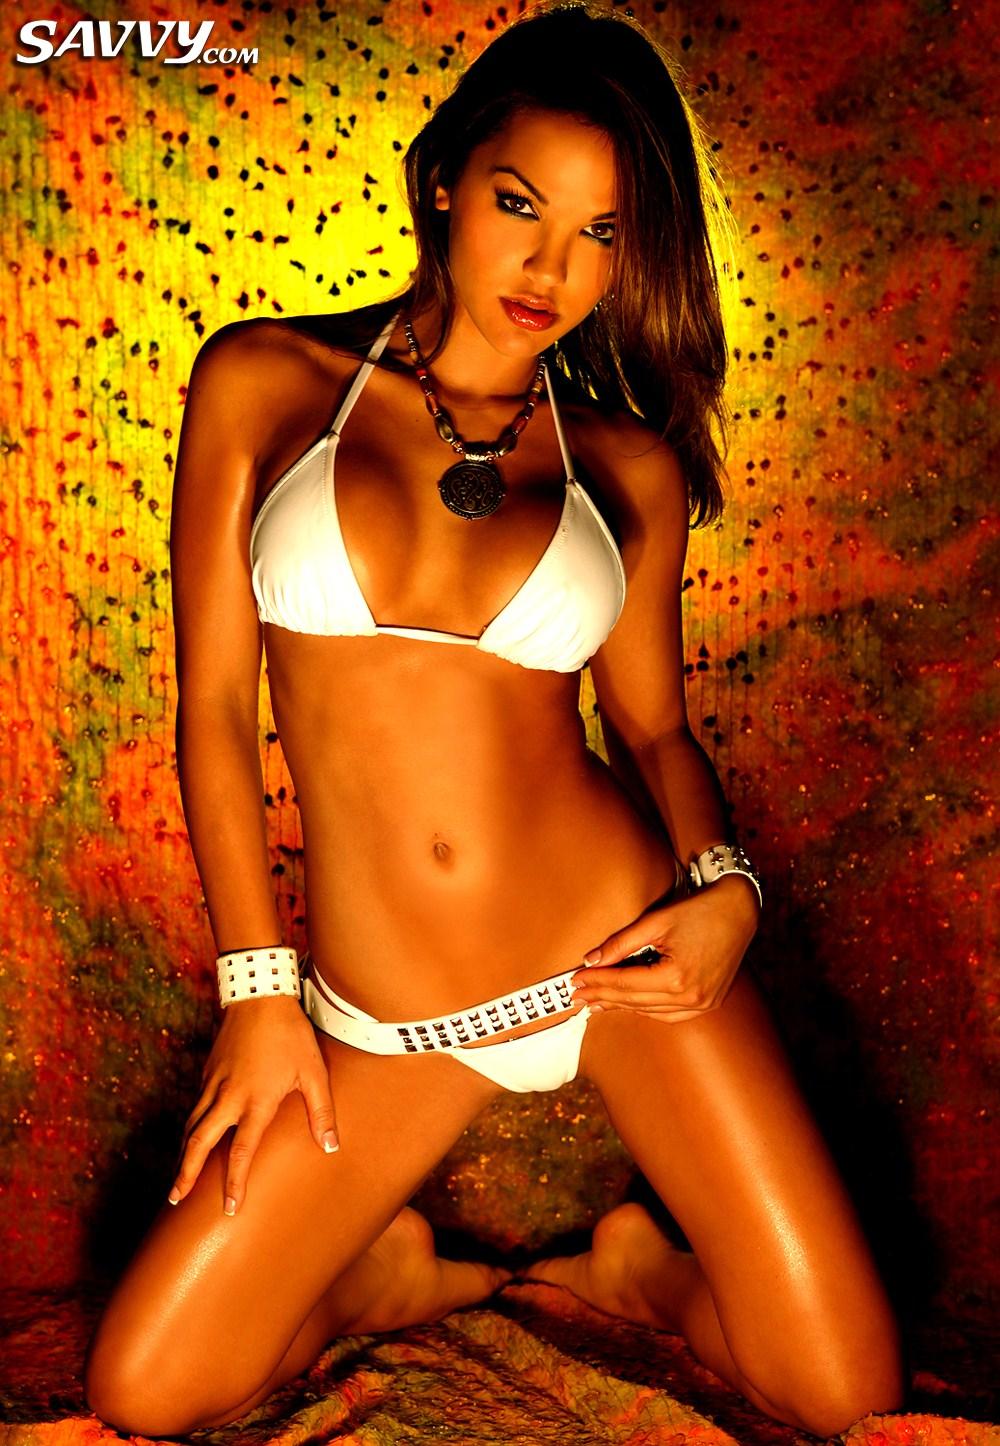 Lorena sanchez offering escort services